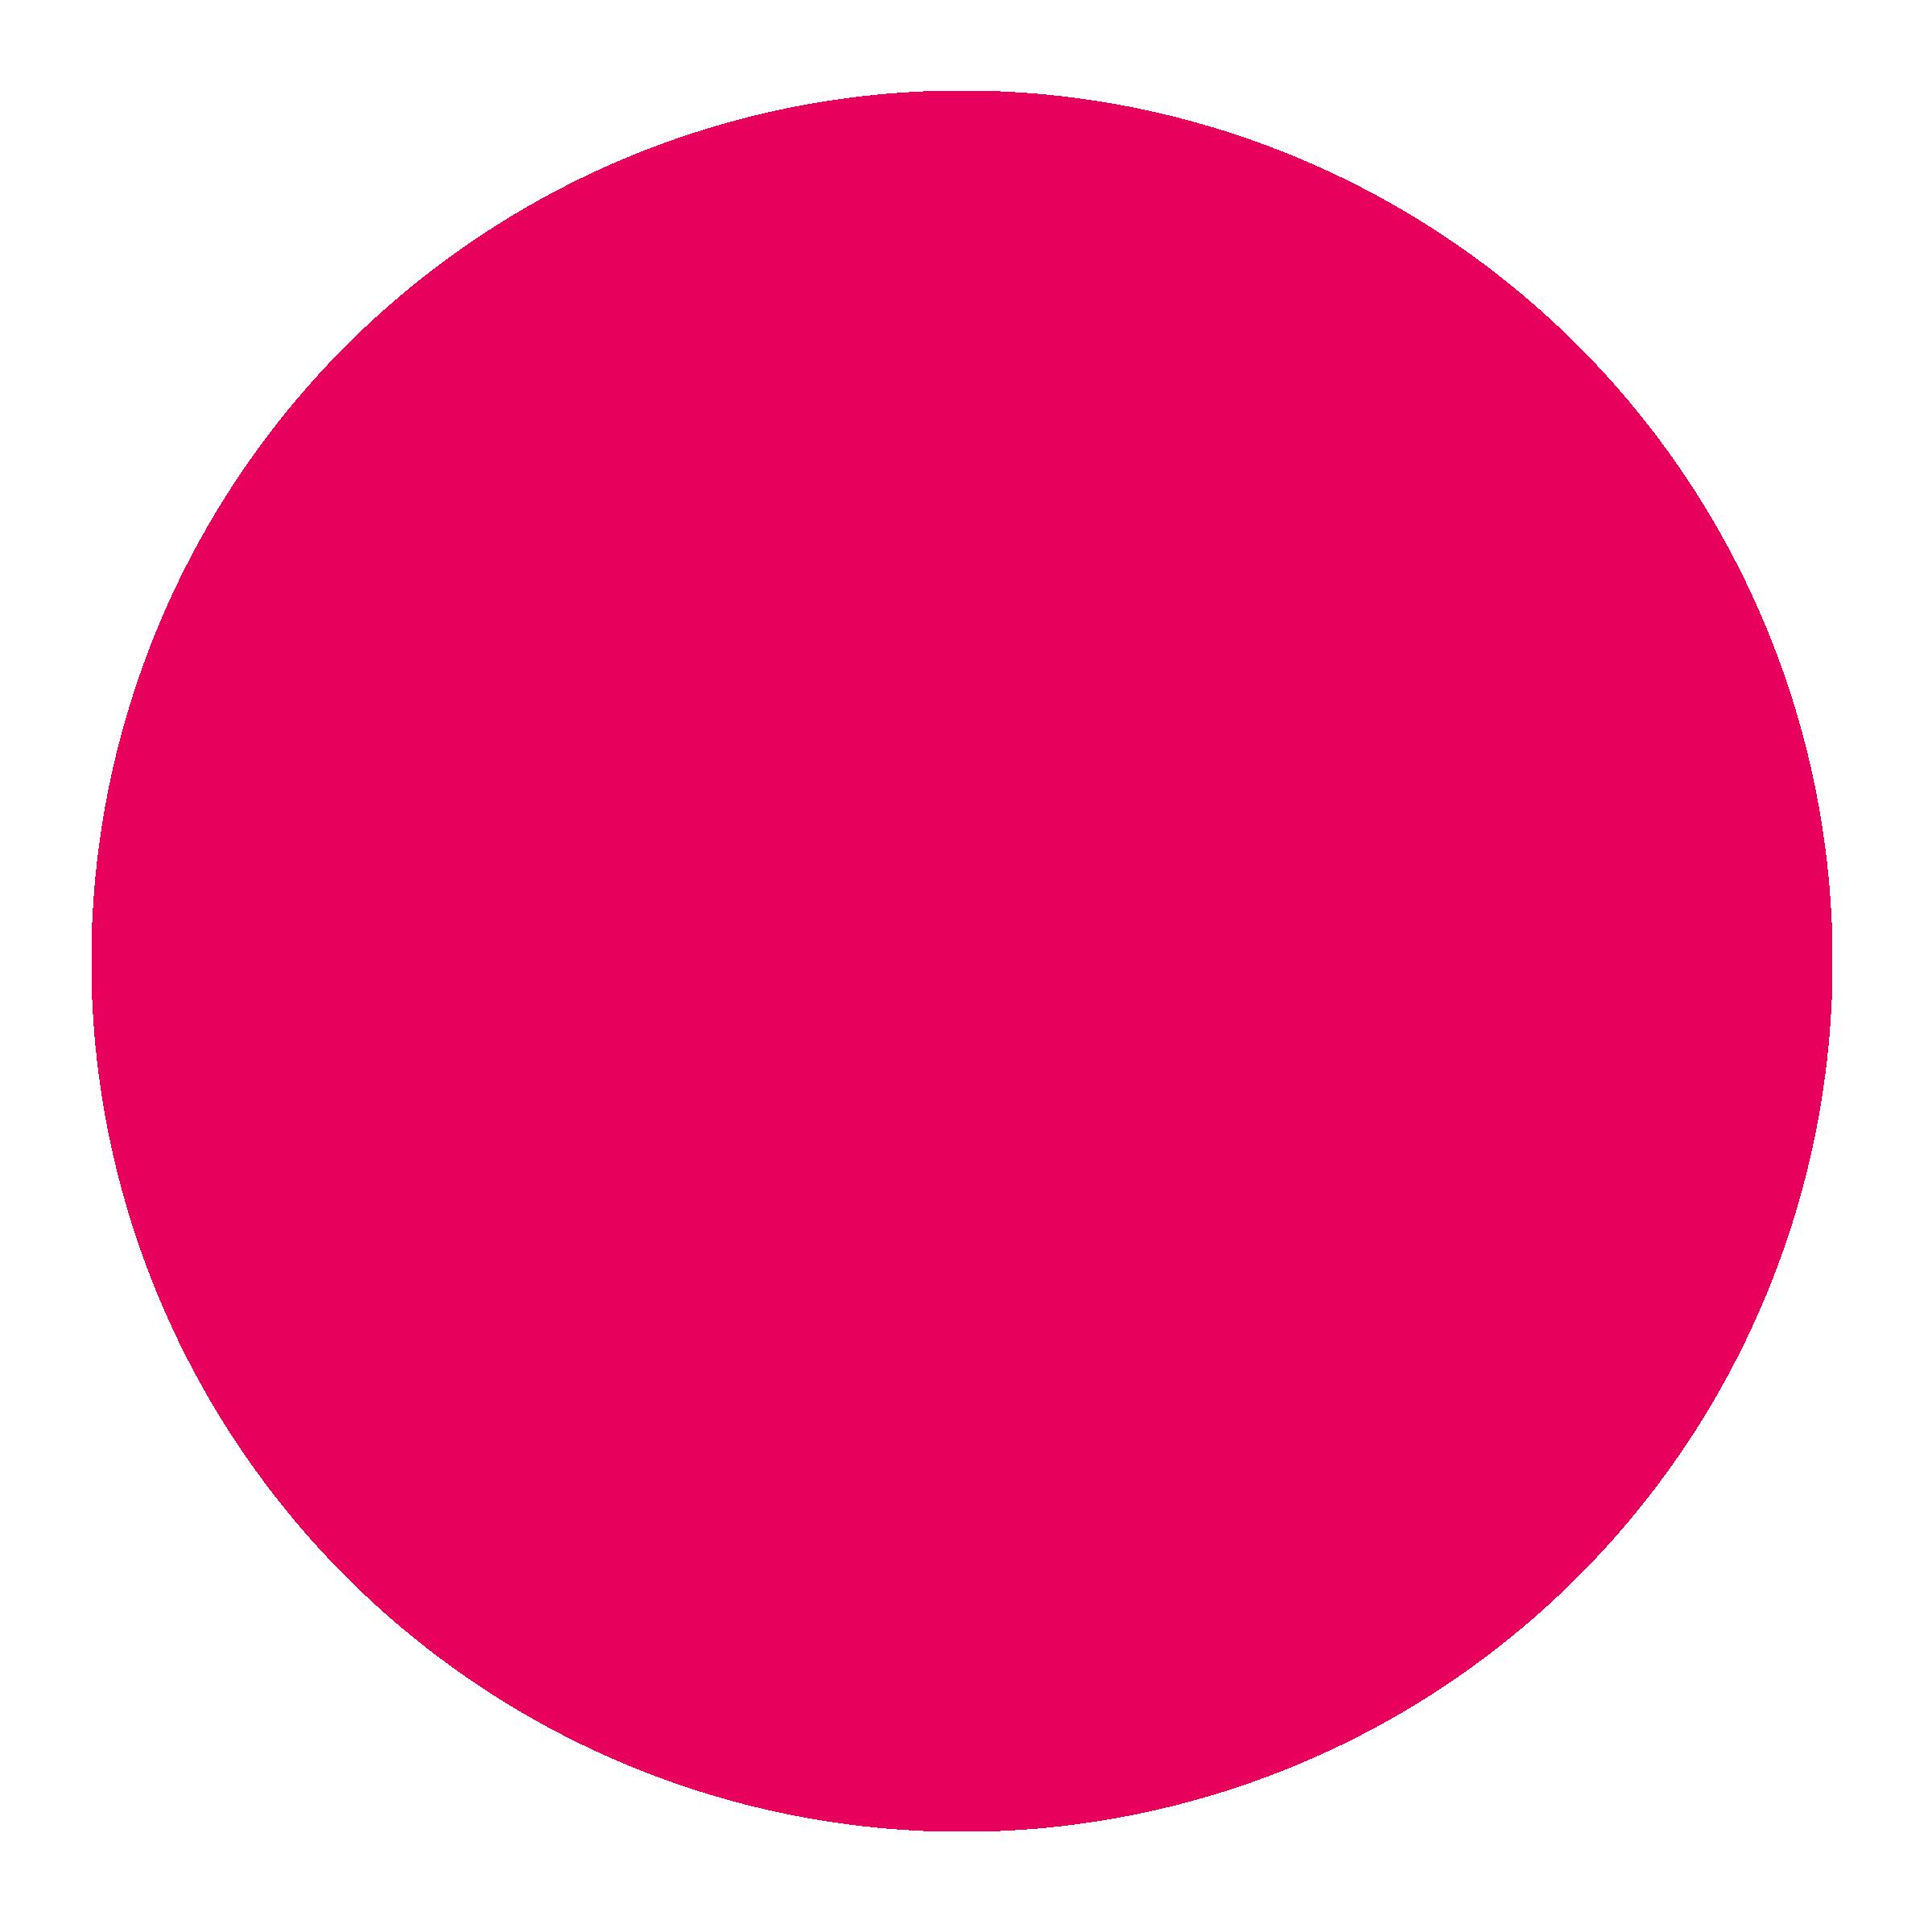 THE PITAYA RED